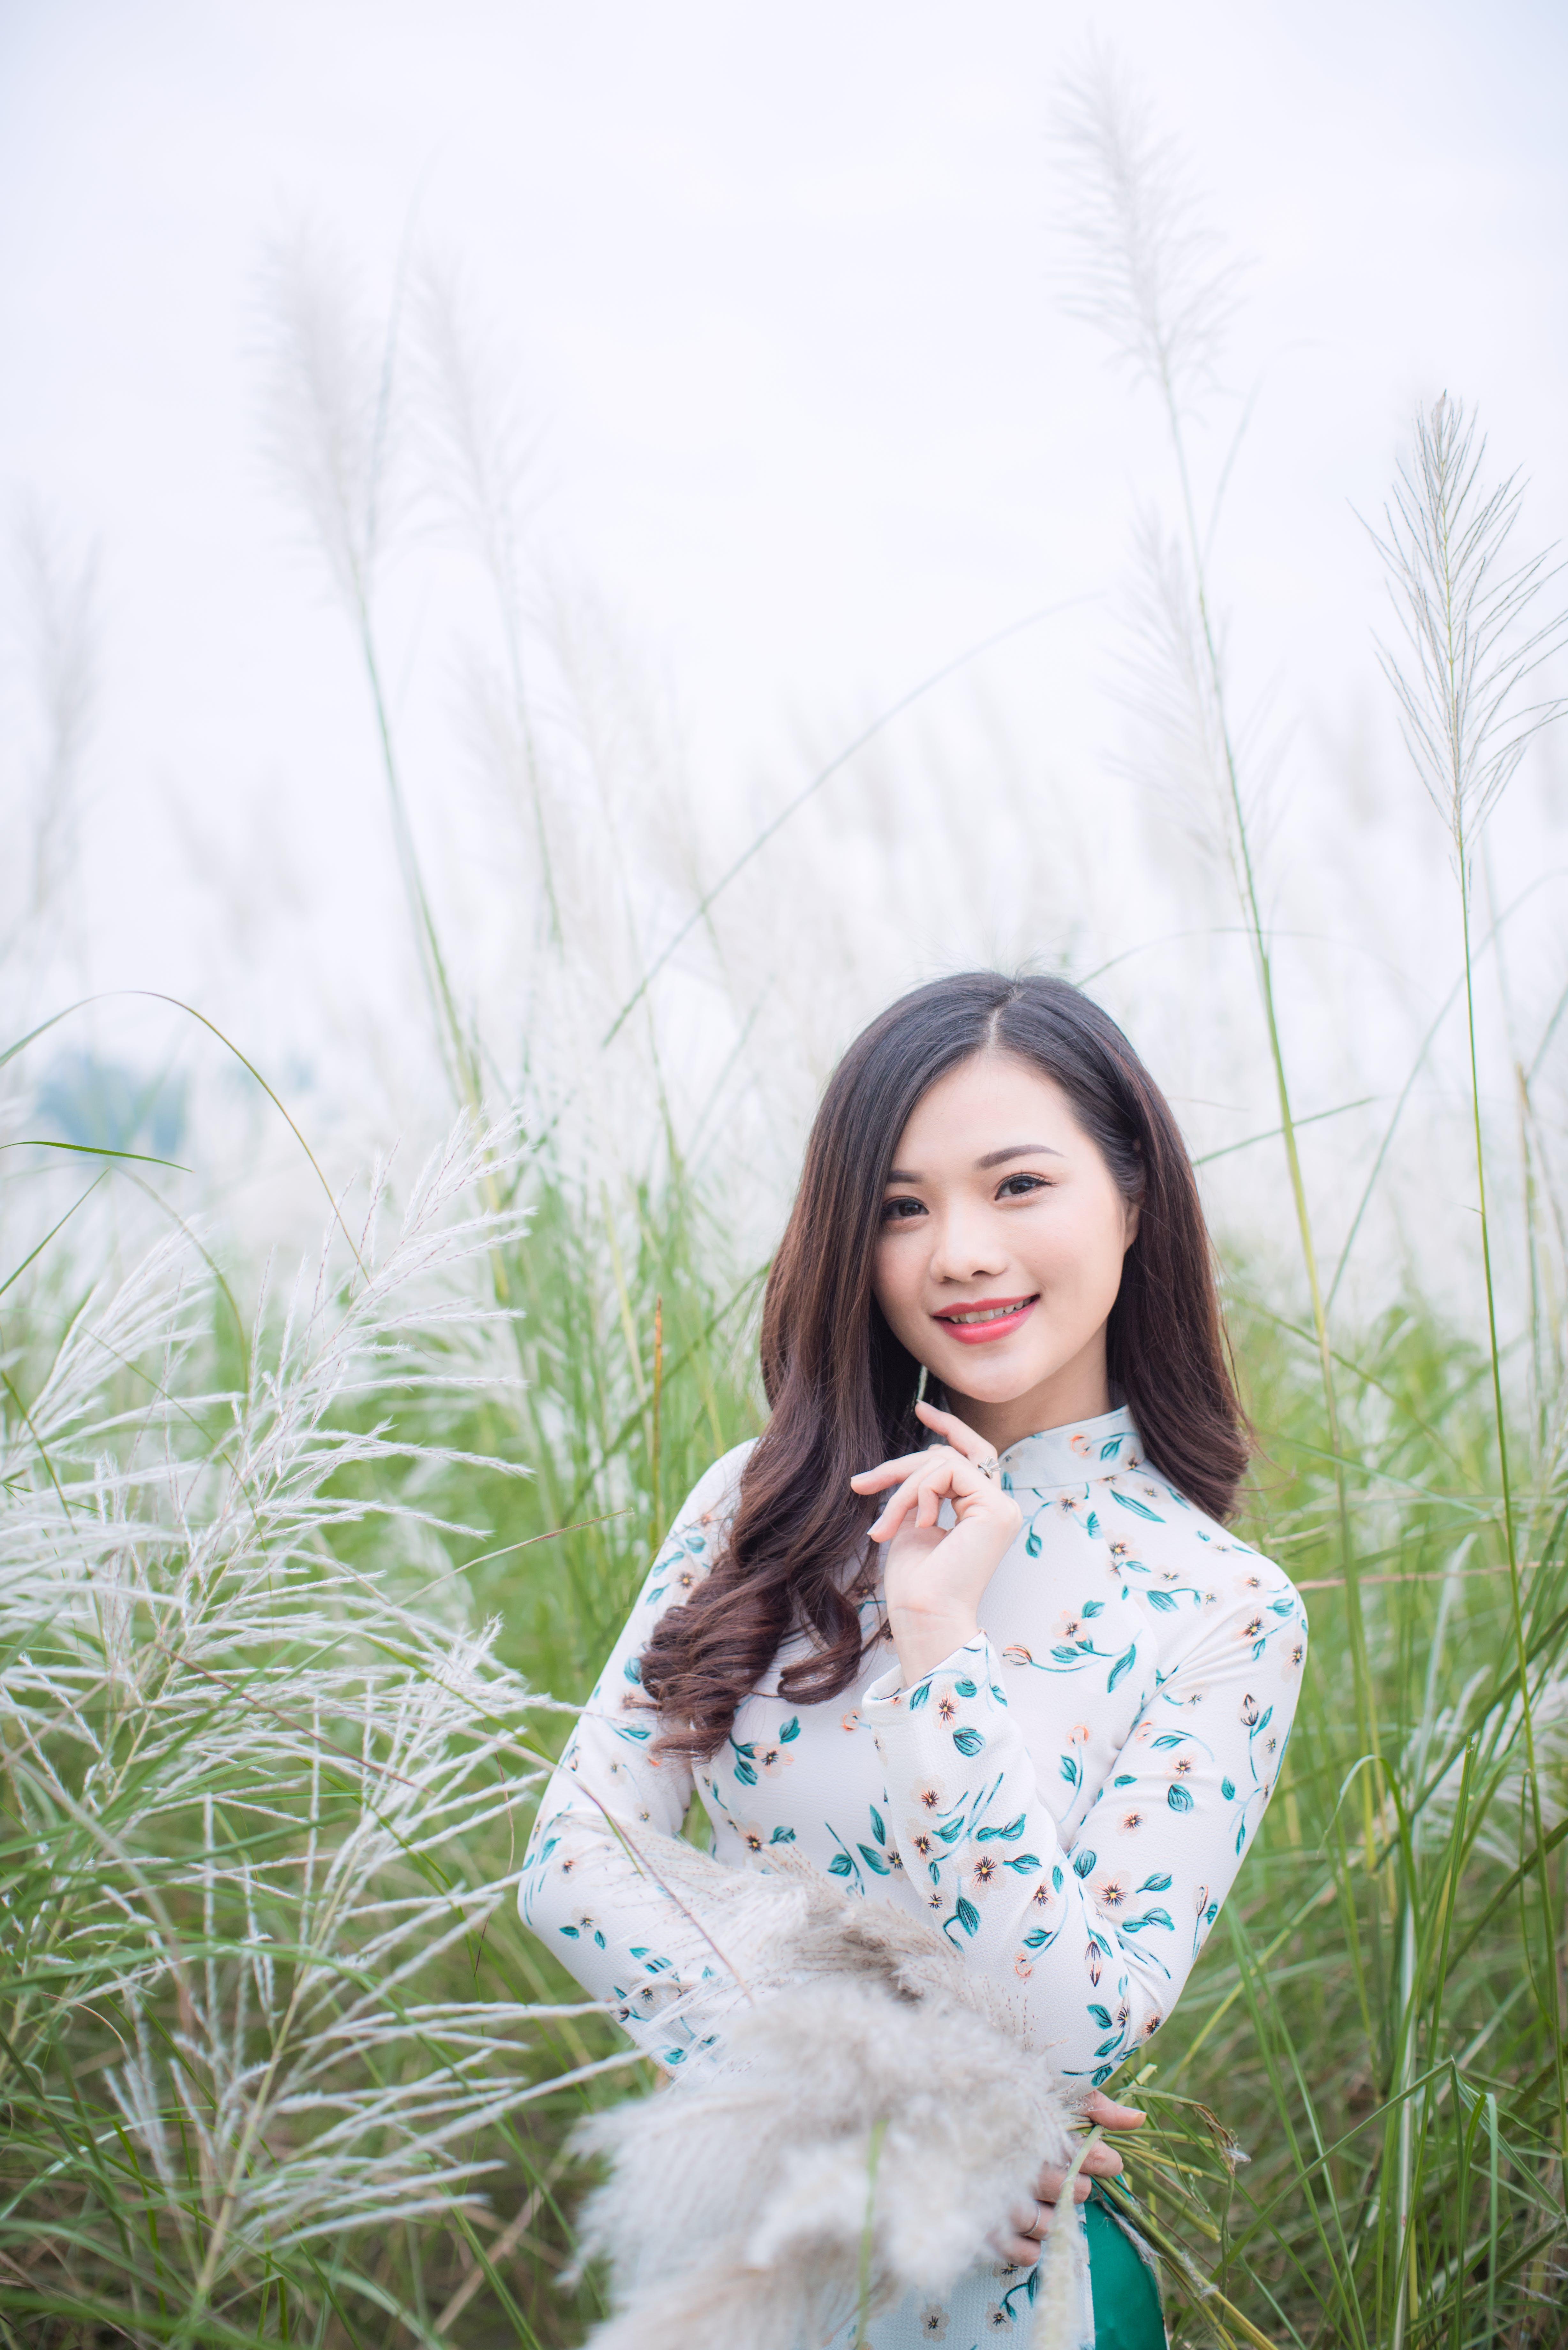 Gratis arkivbilde med åker, asiatisk jente, asiatisk kvinne, attraktiv